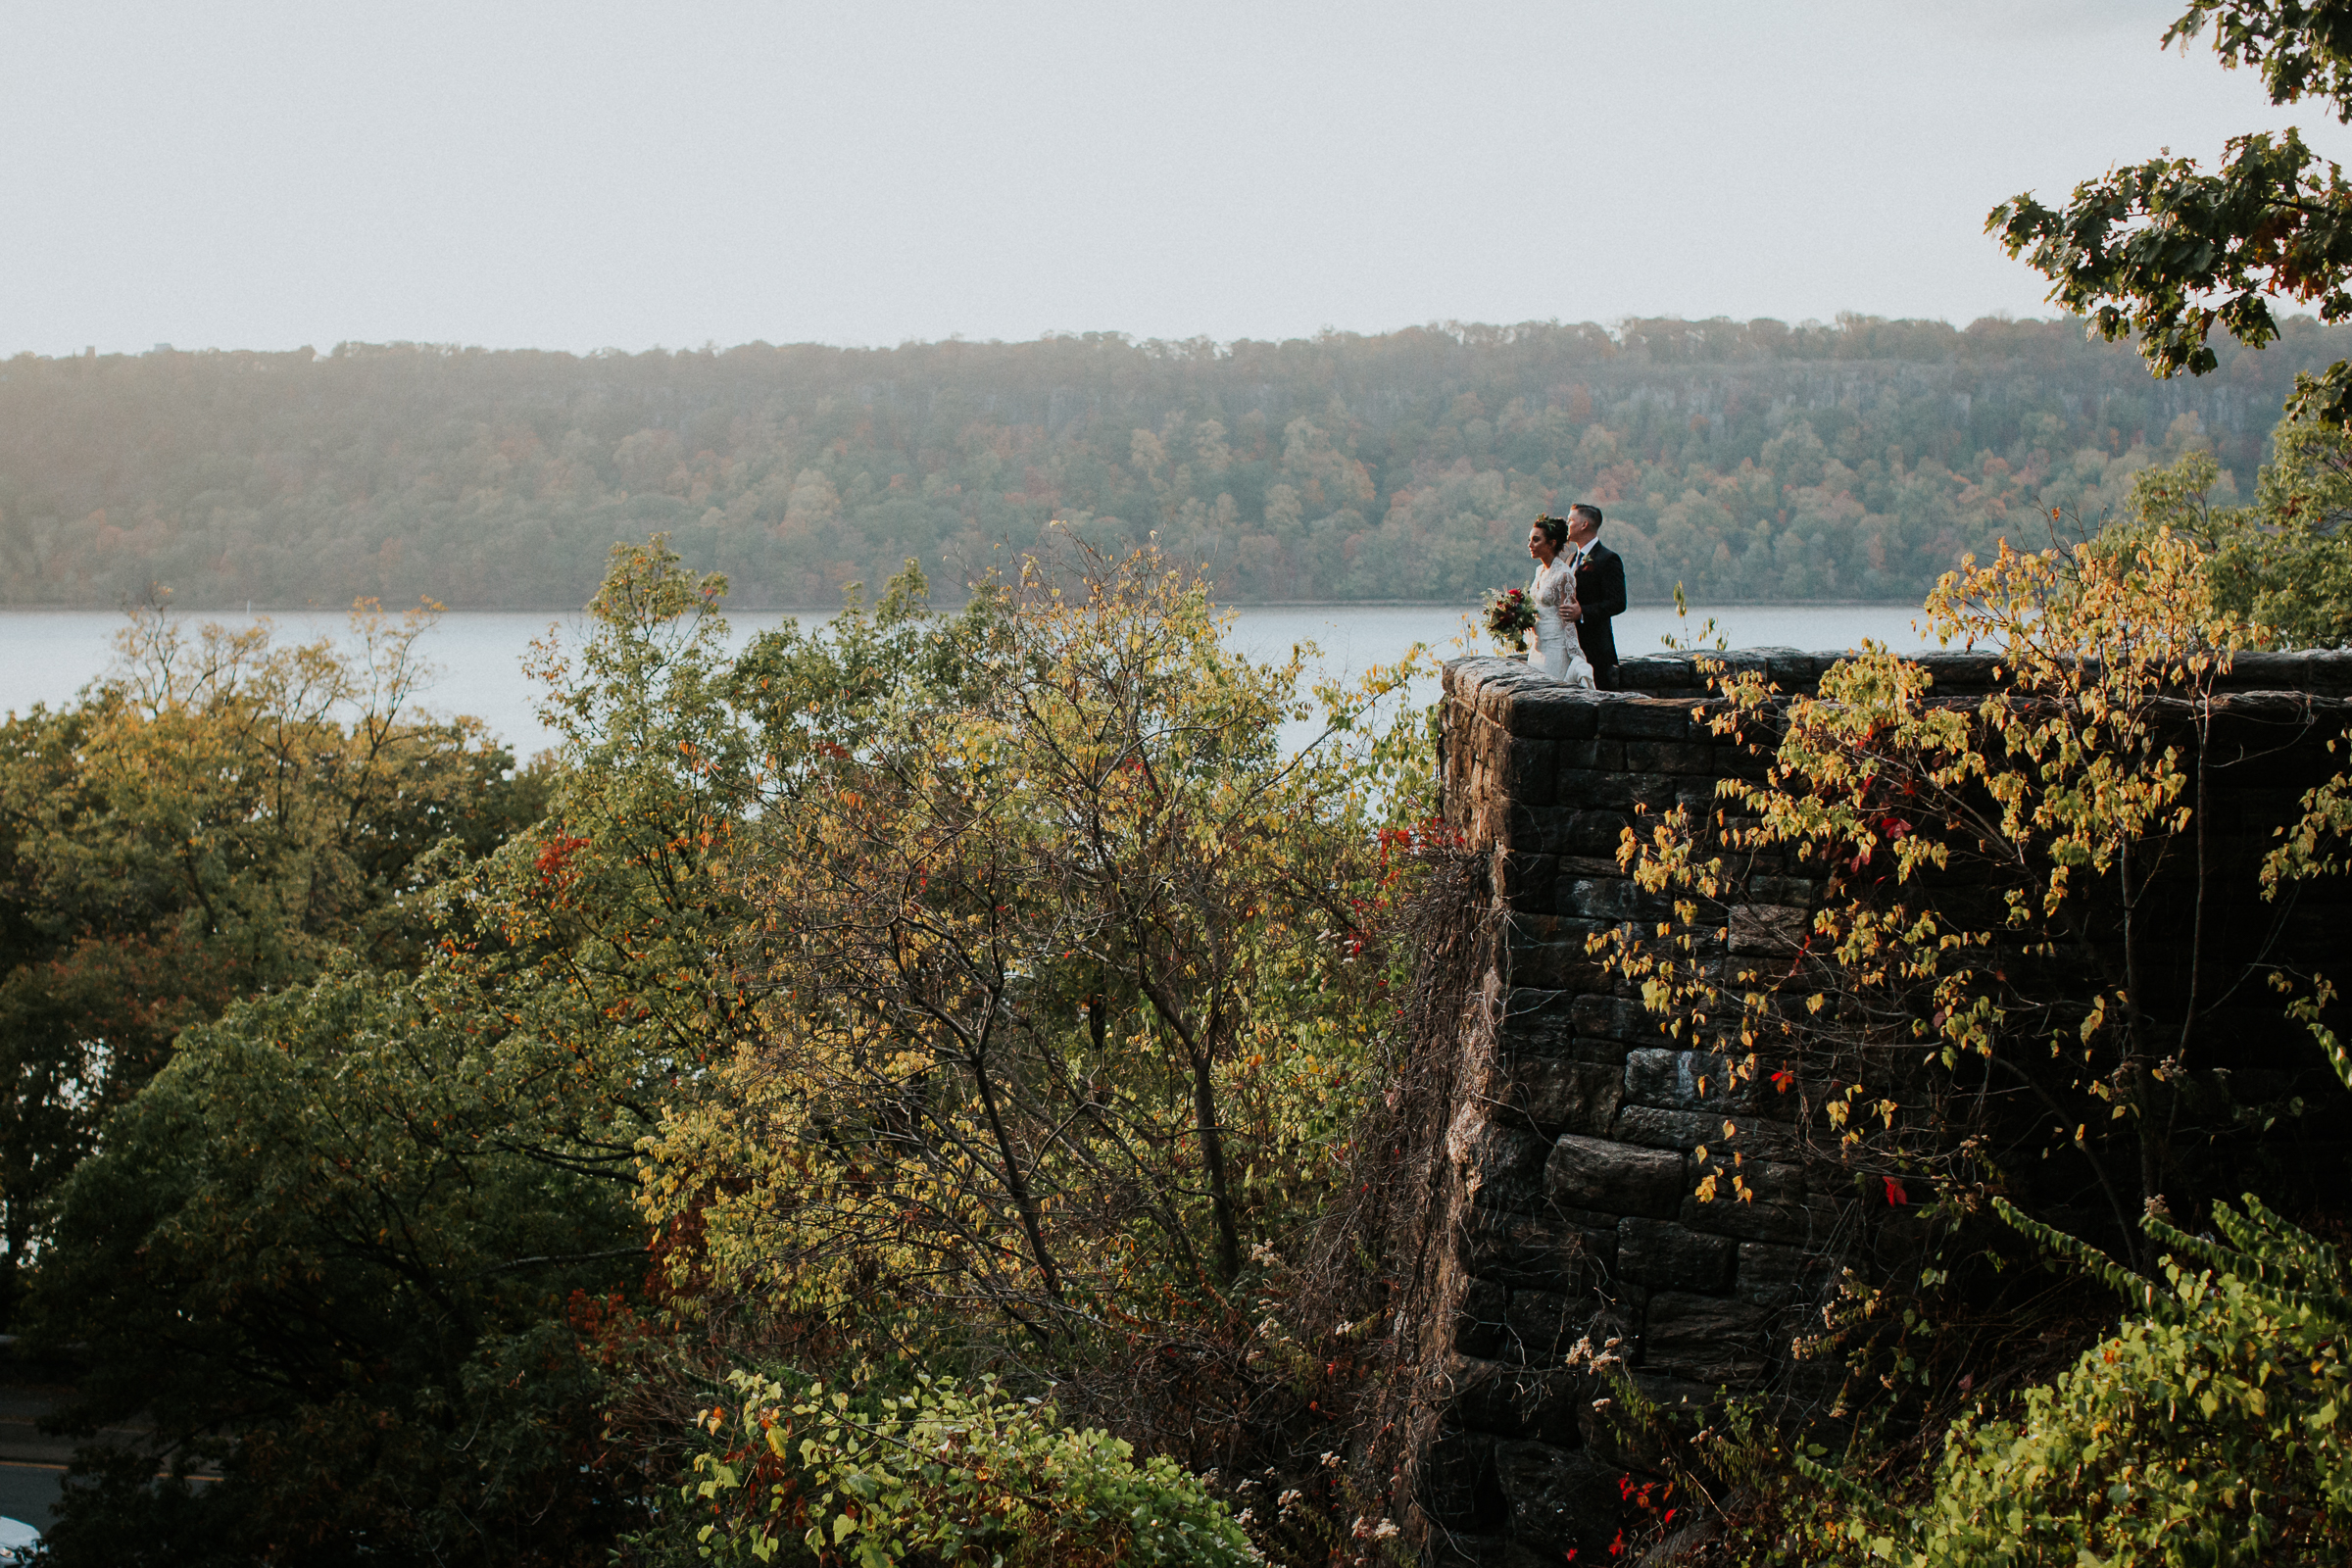 New-York-Documentary-Wedding-Photography-Best-Of-2017-by-Elvira-Kalviste-Photography-125.jpg